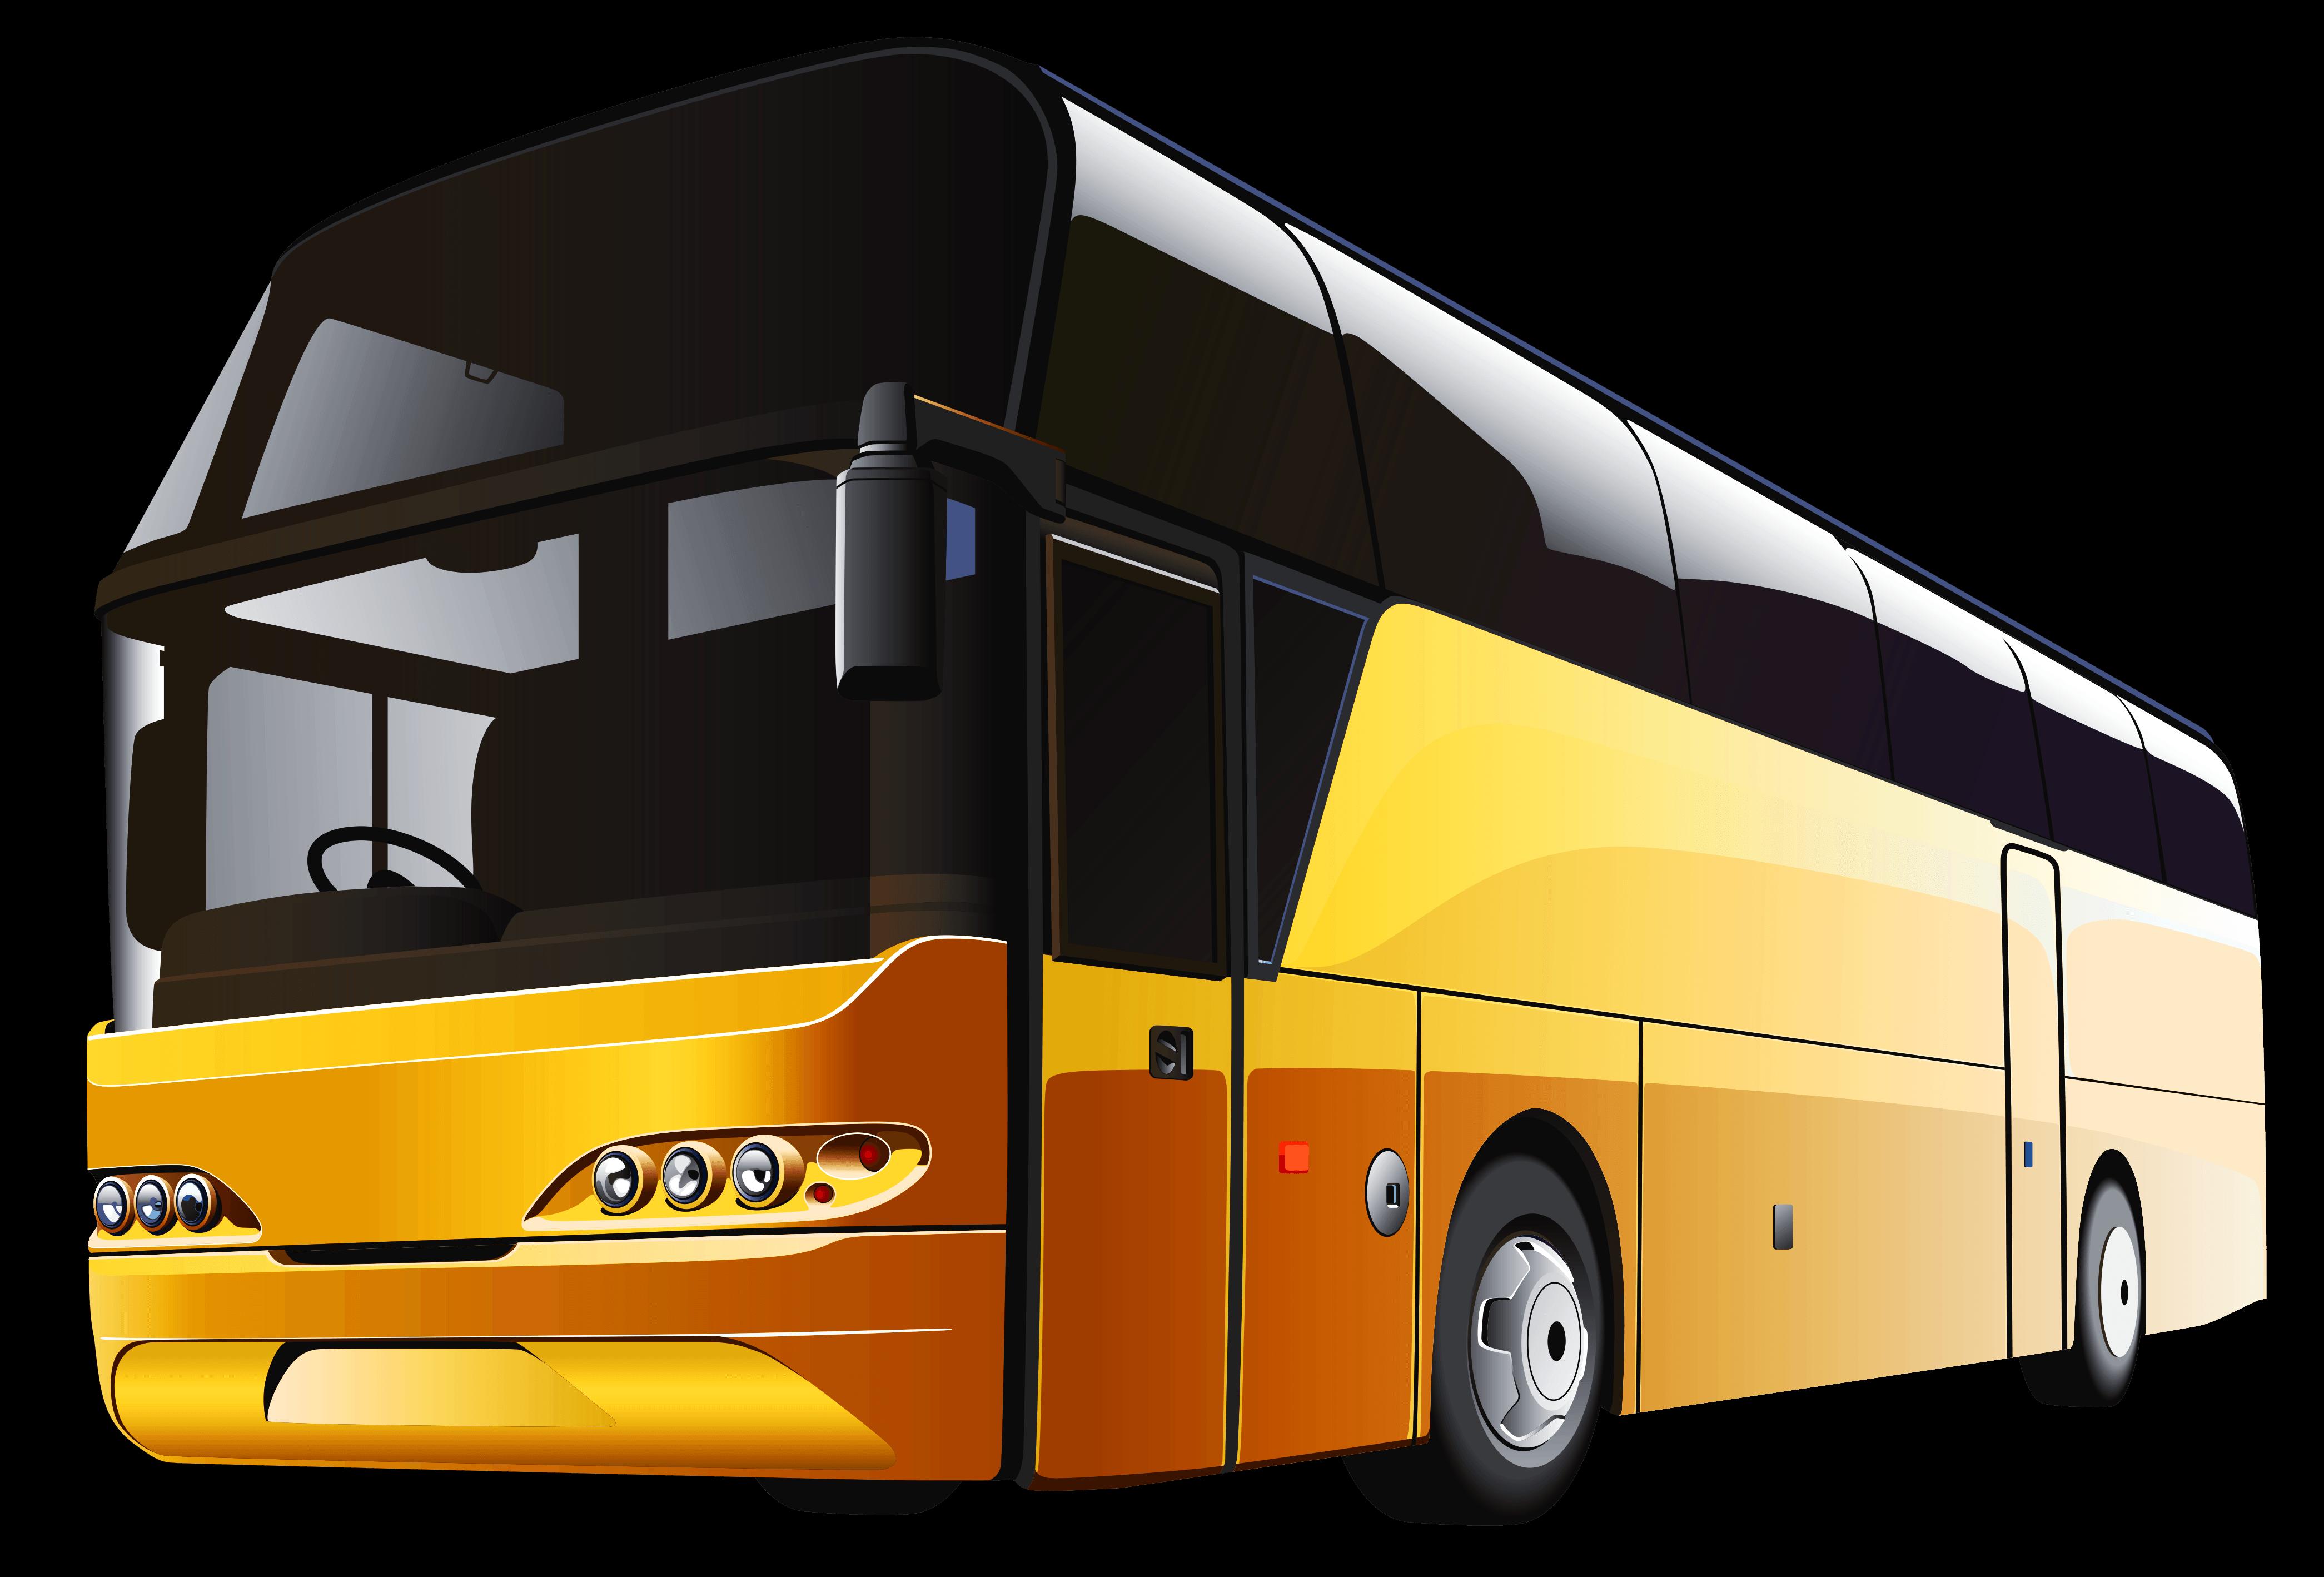 Horn clipart clip art. Free bus cliparts download